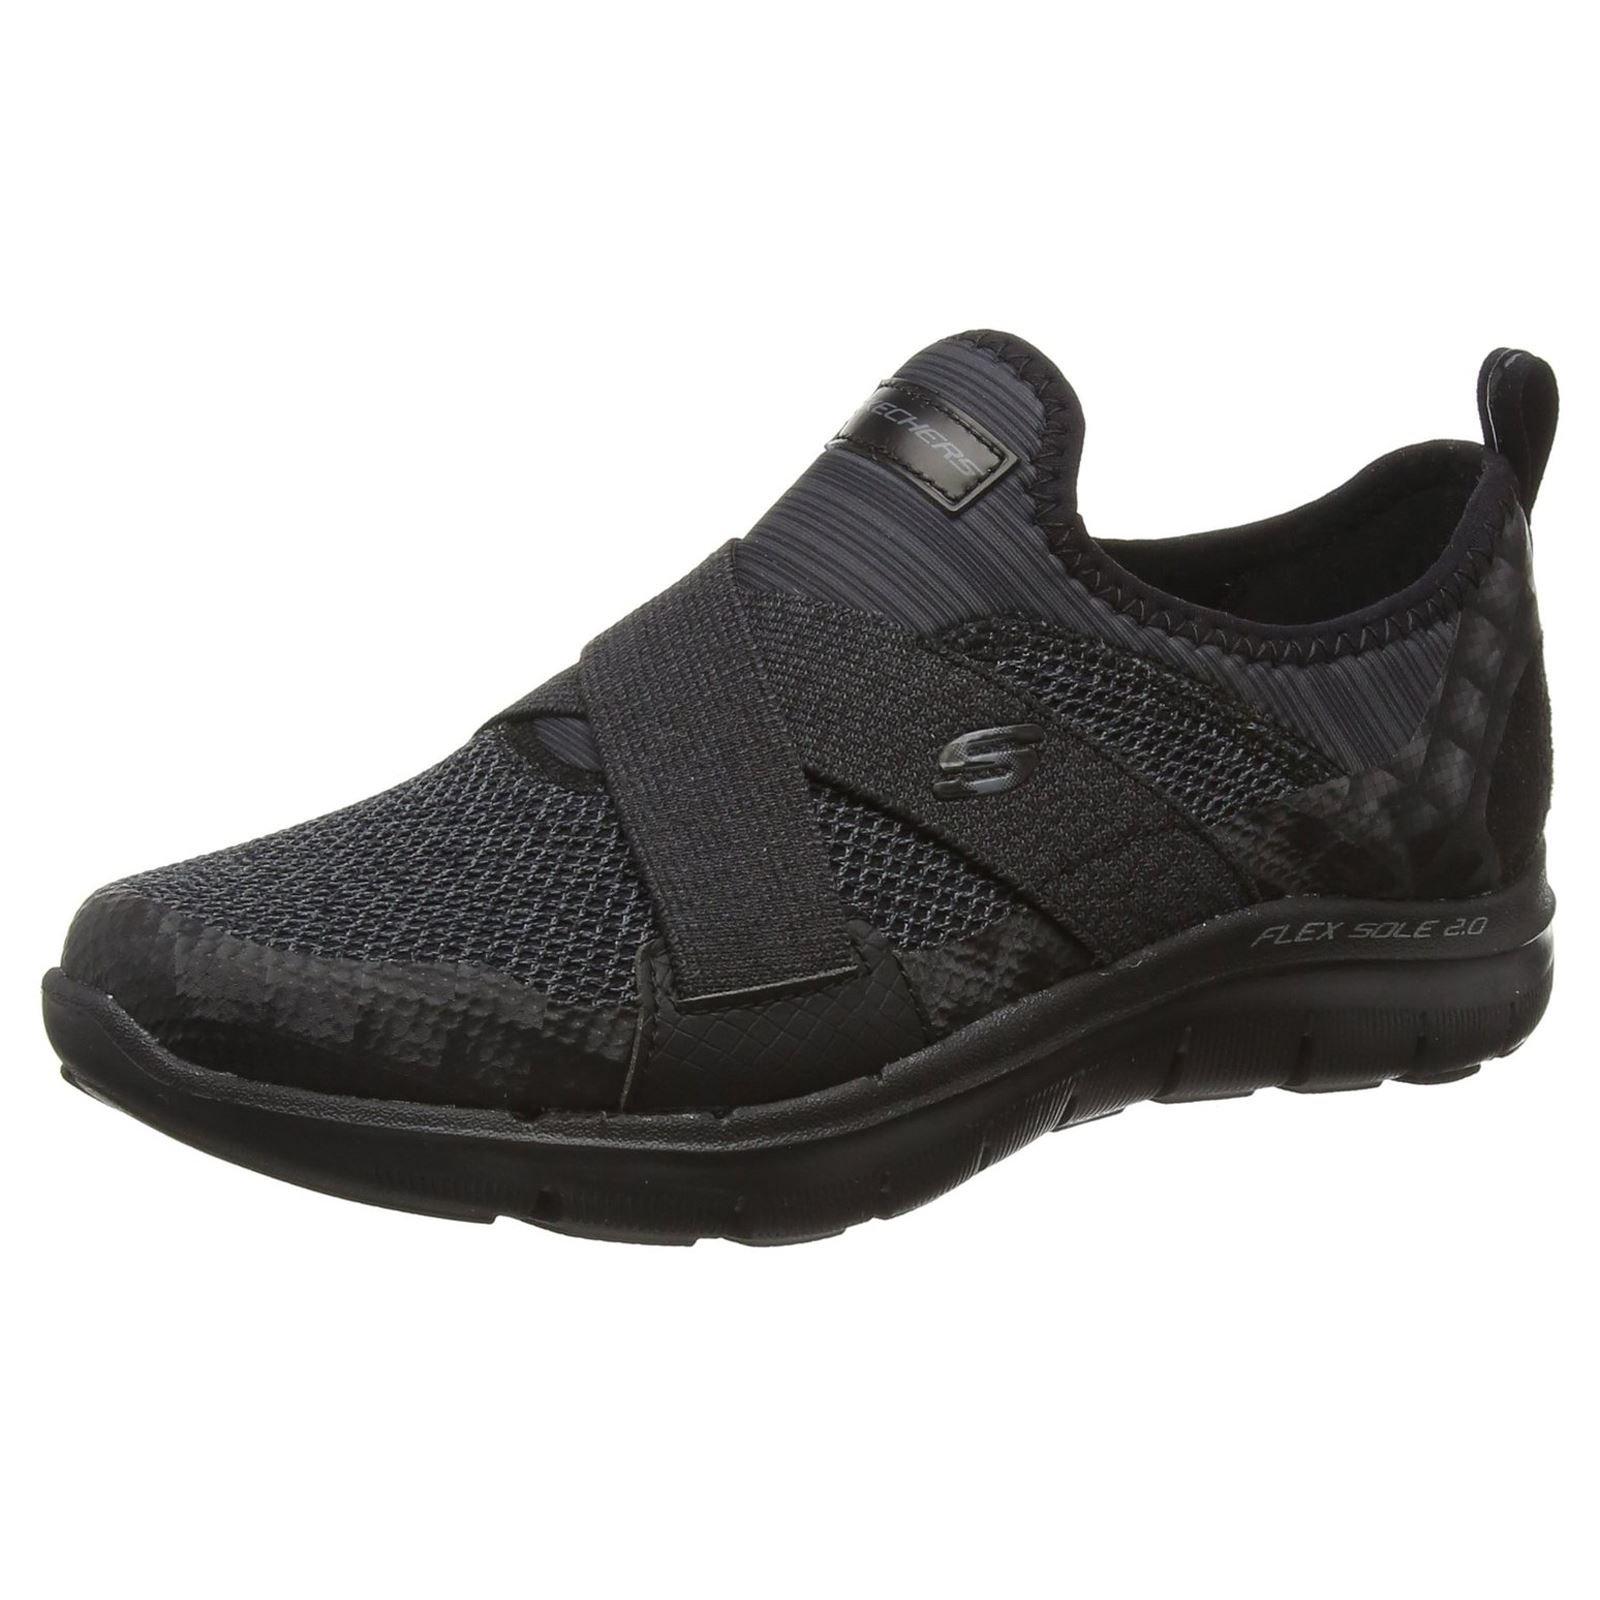 Skechers Flex Appeal 2.0 New Image Womens Slip On Sneakers Black 10